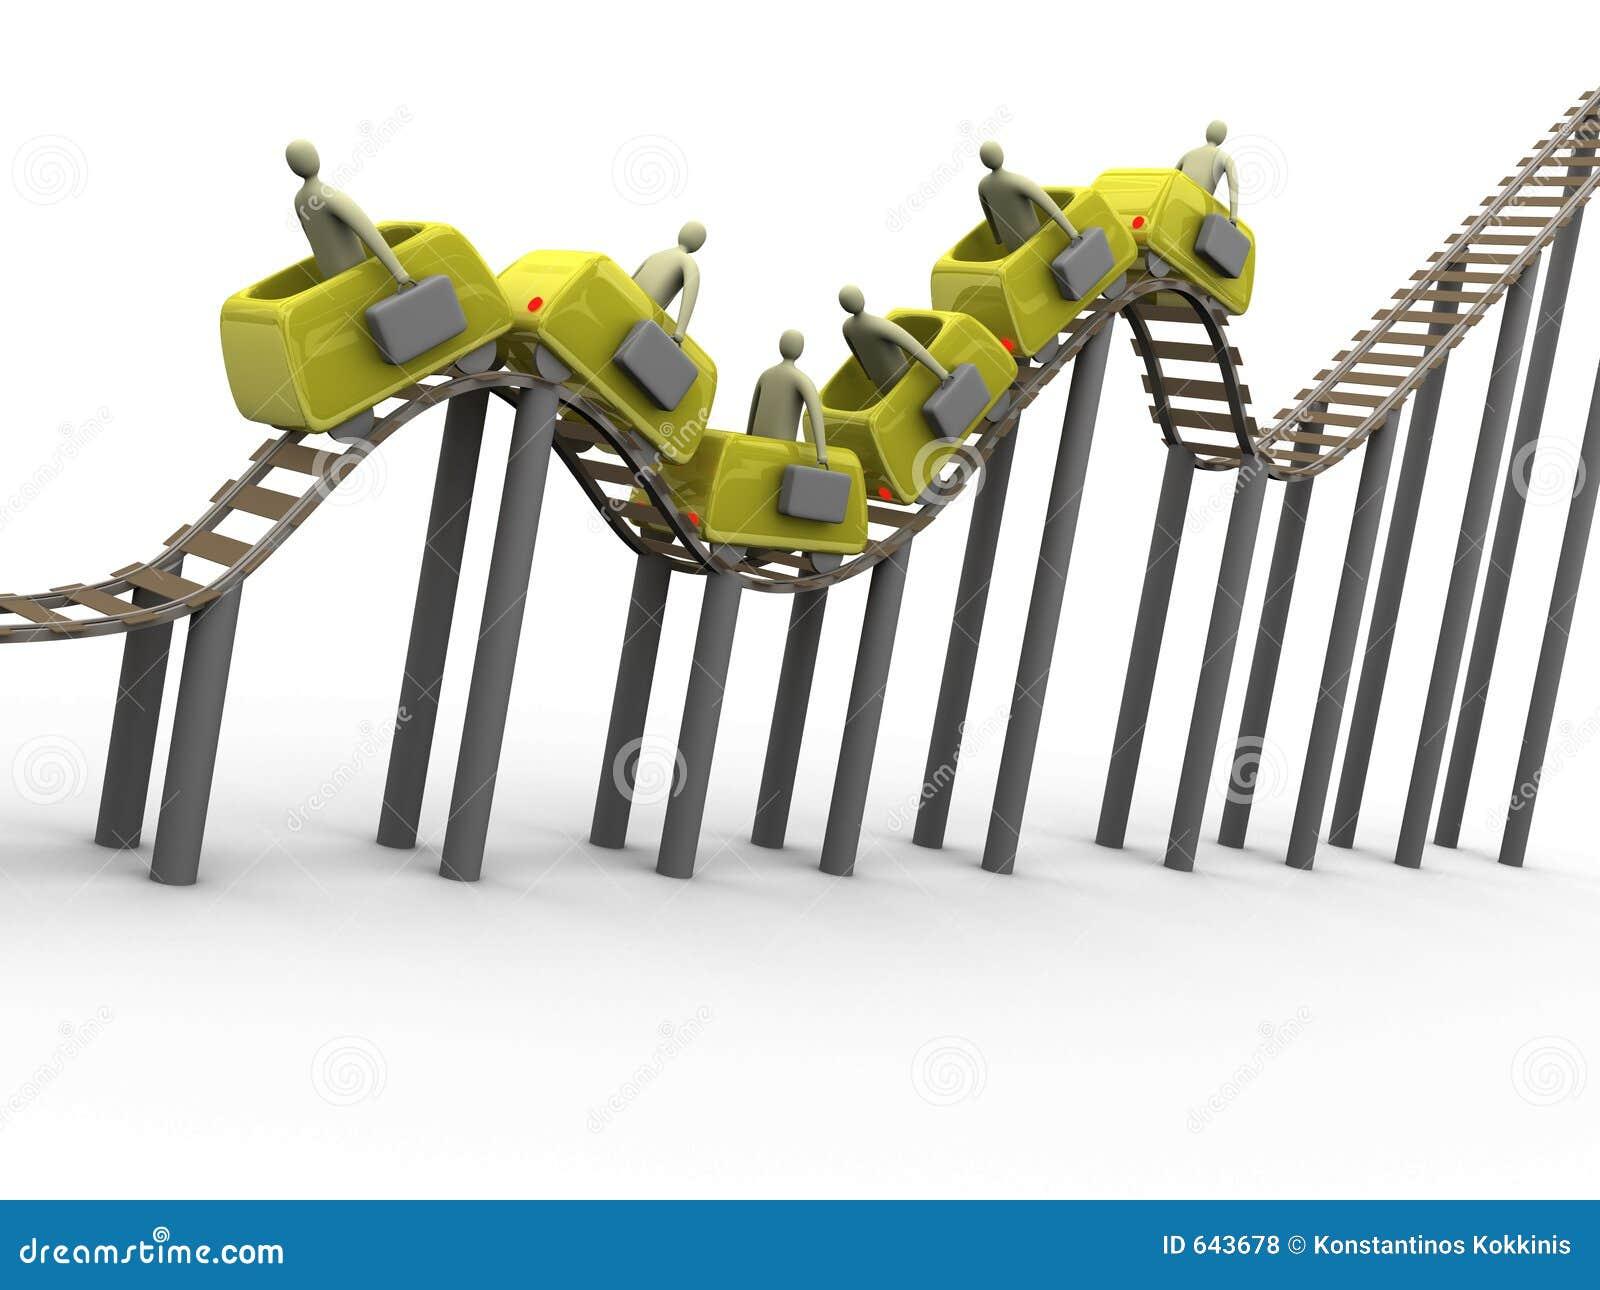 x2 roller coaster seats - photo #43